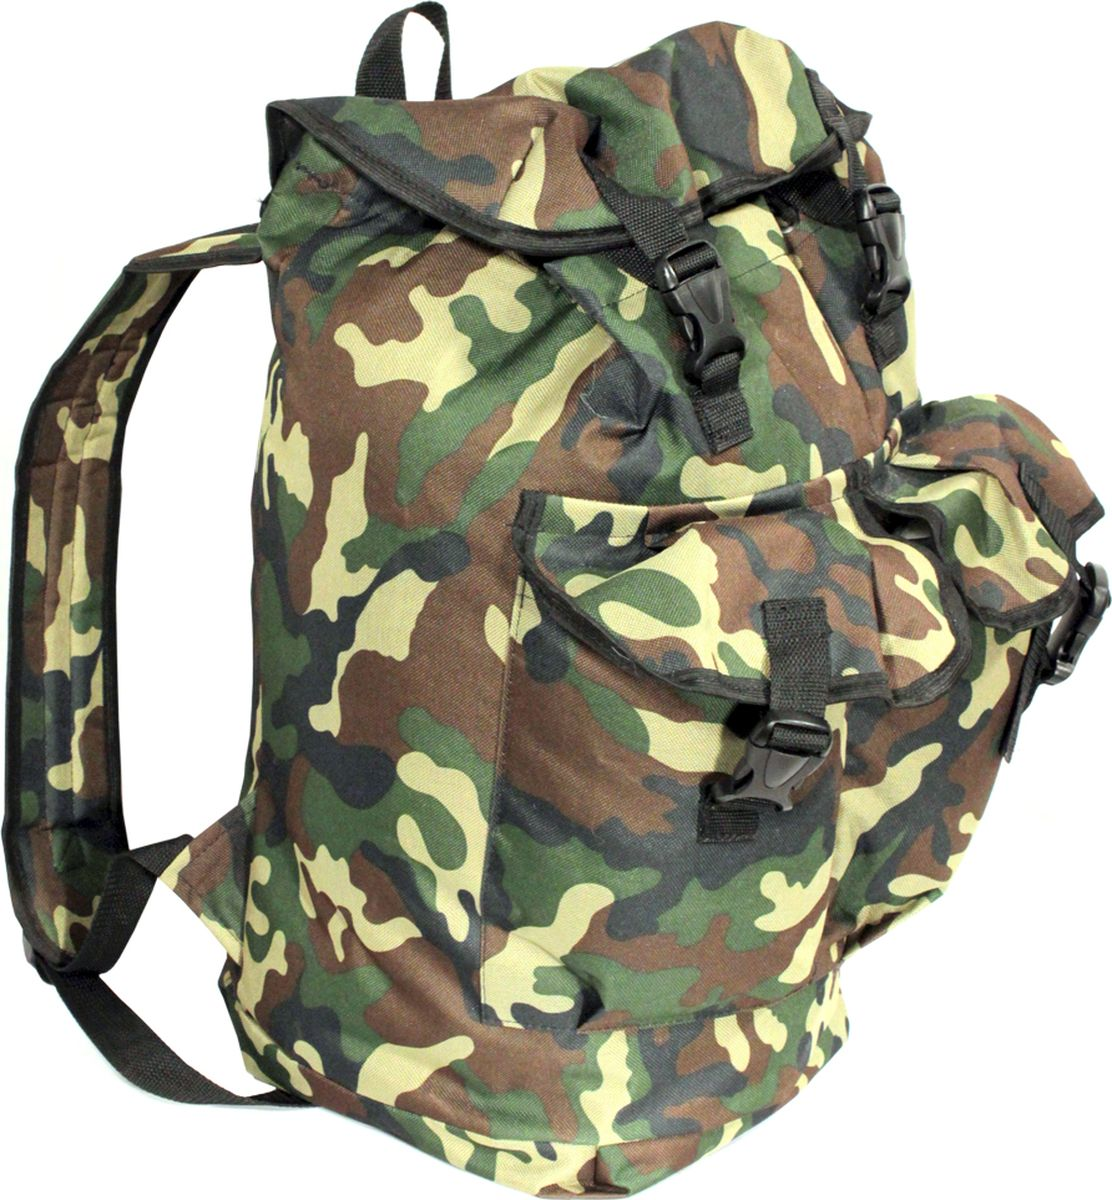 Рюкзак туристический Каприкорн Таежный Люкс, 30 л ostin рюкзак с двумя карманами